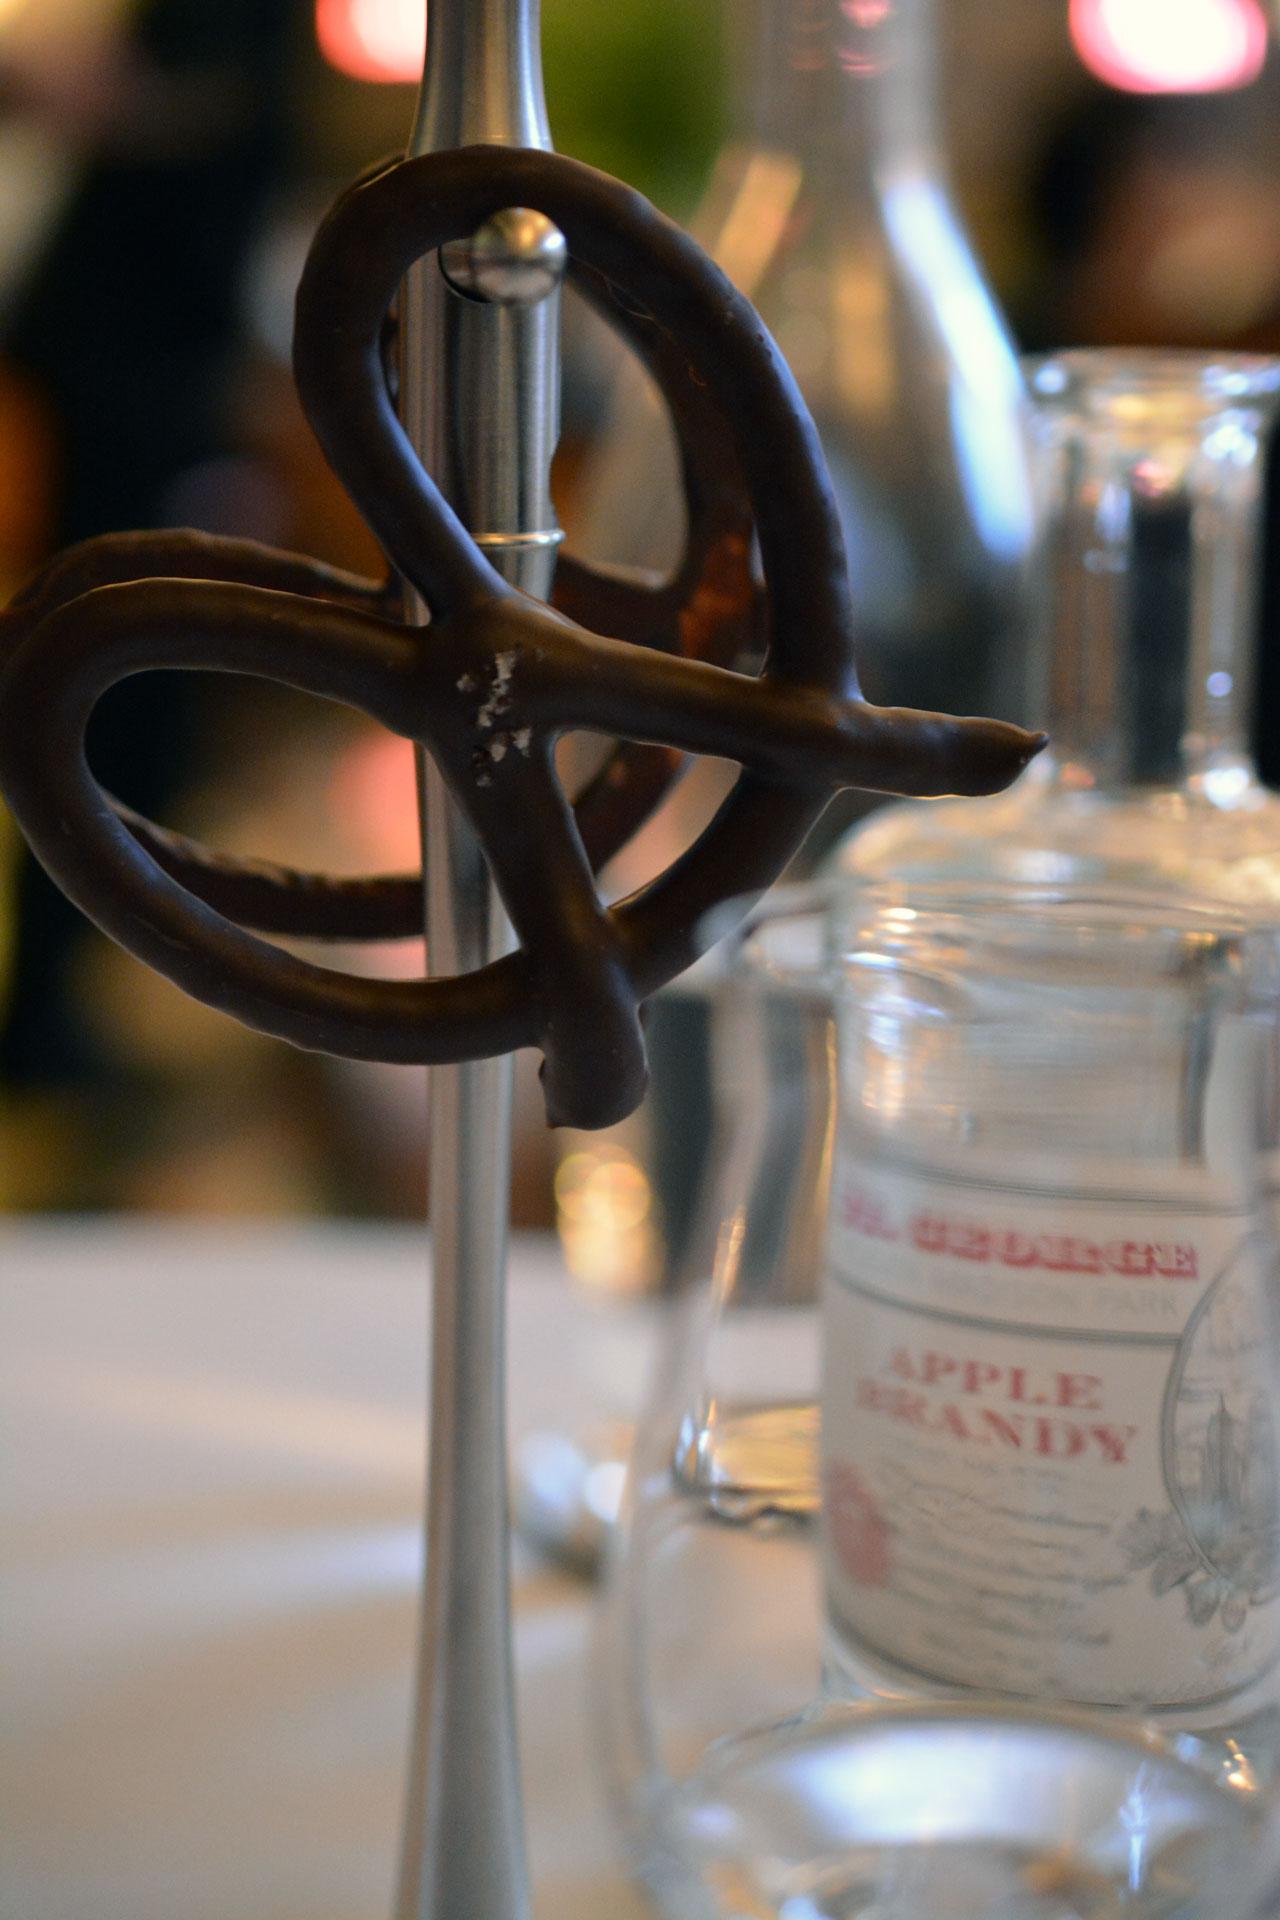 Schoko-Brezel mit Meersalz und Apfel-Brandy